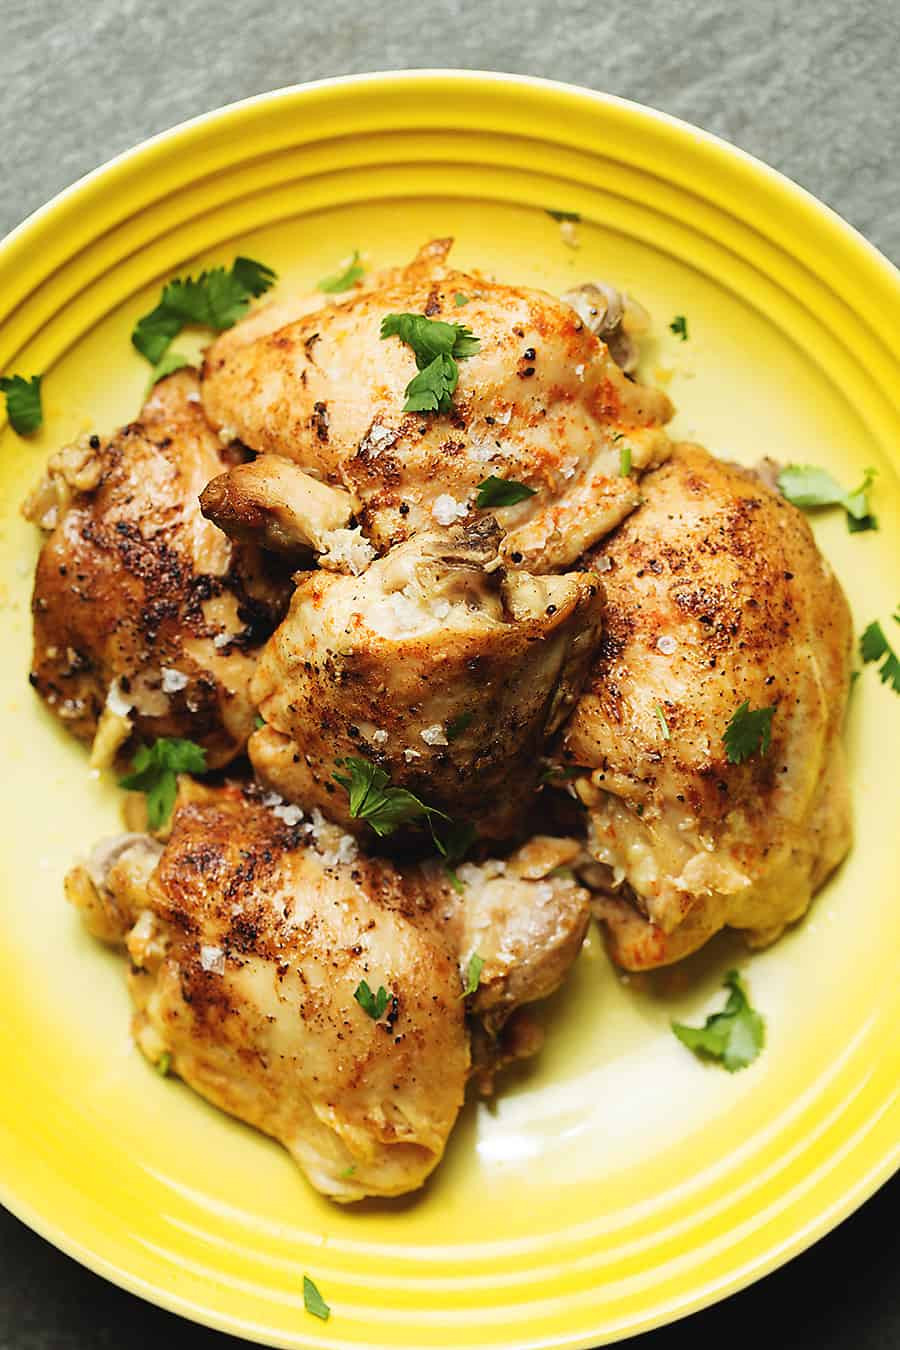 Instant Pot Boneless Skinless Chicken Thighs  Instant Pot Chicken Thighs • Low Carb with Jennifer